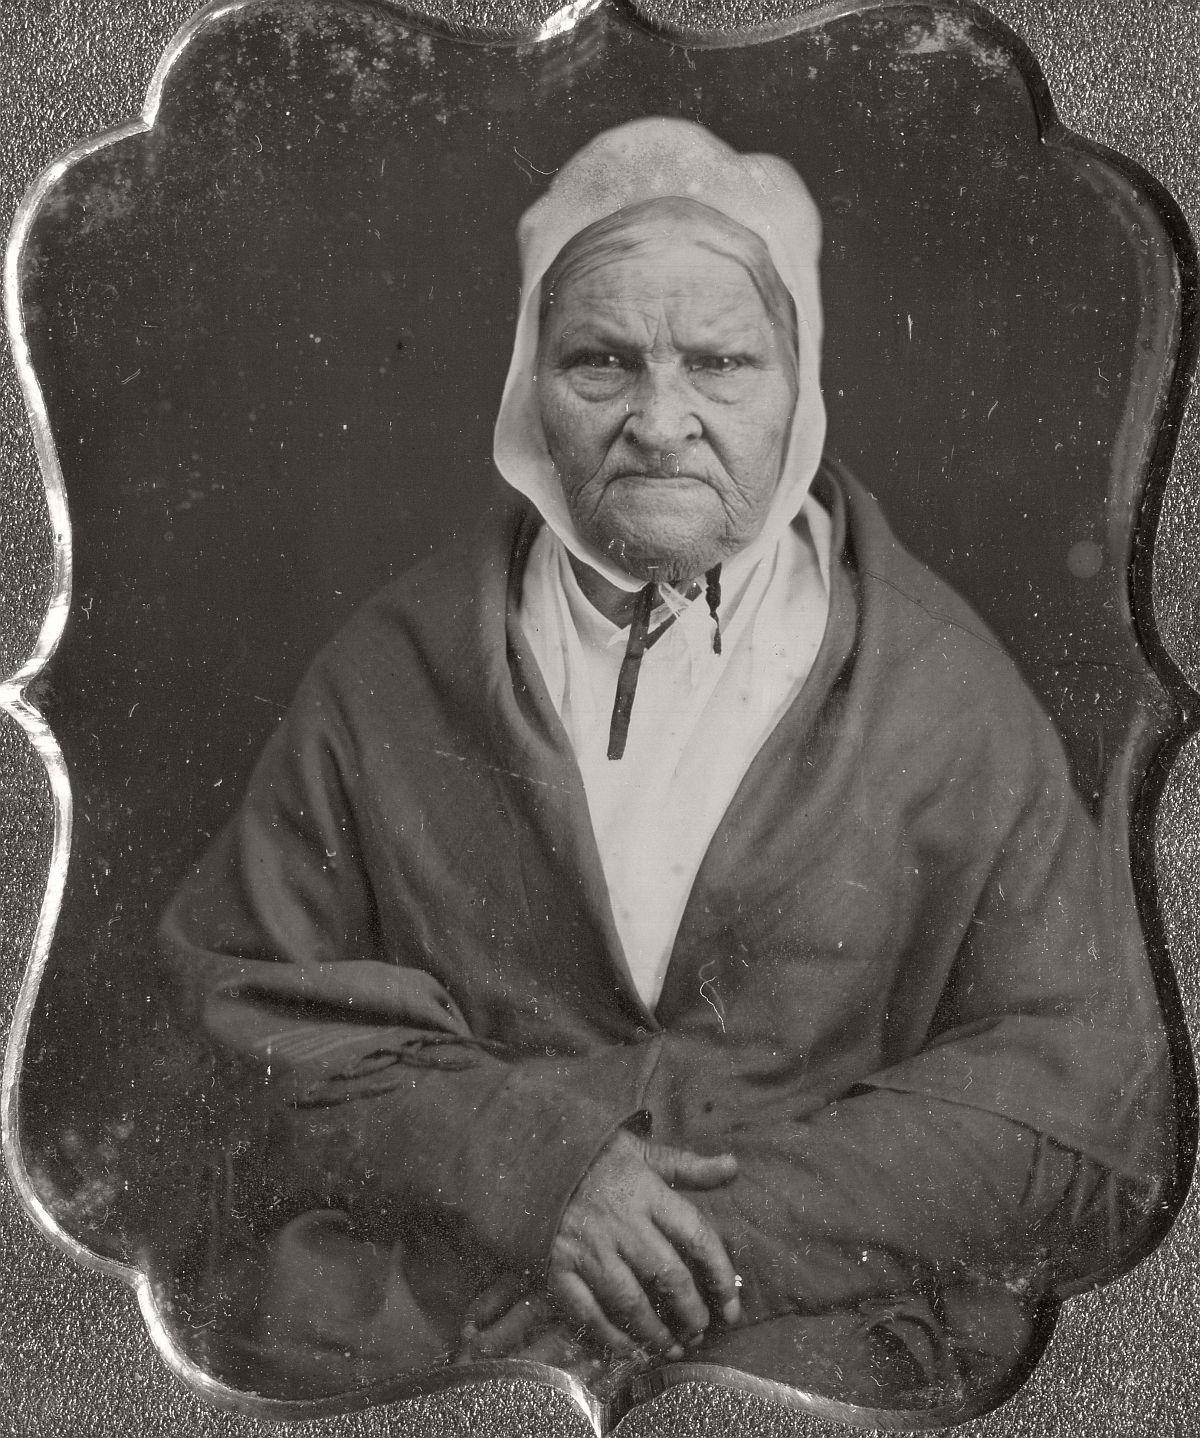 daguerreotype-portrait-ladies-born-in-the-late-18th-century-1700s-vintage-19